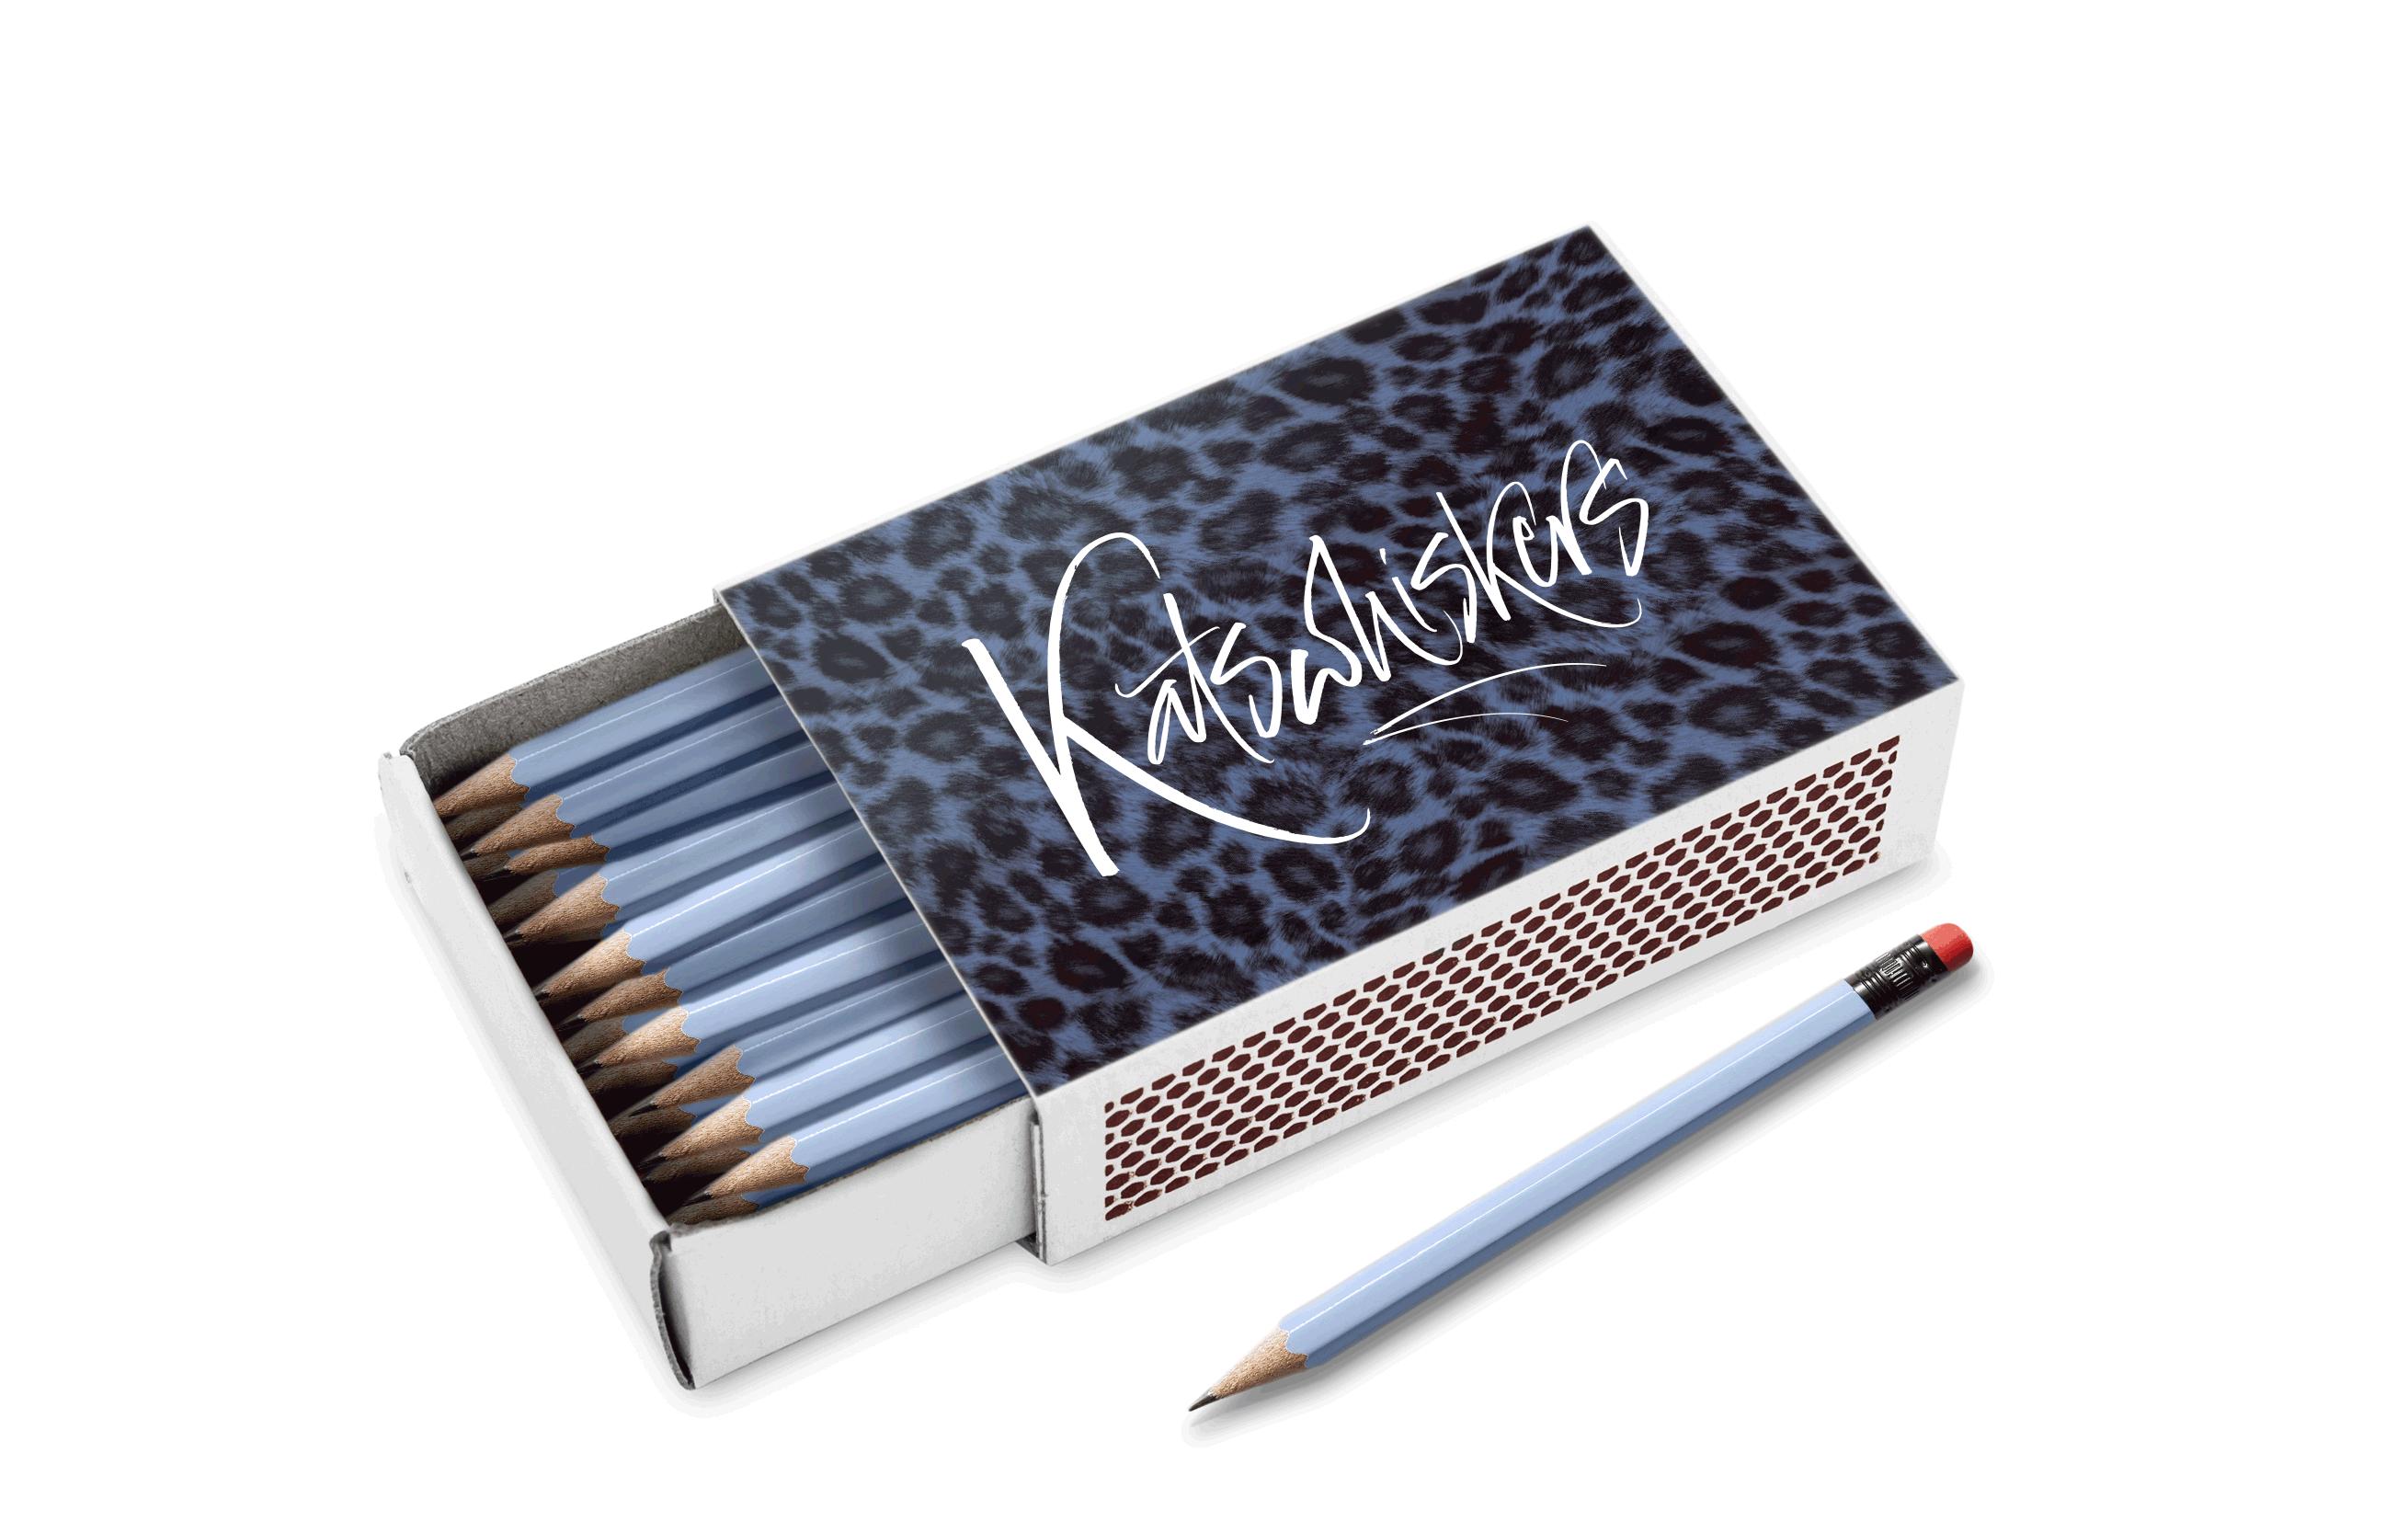 Katswhiskers matchbox creative